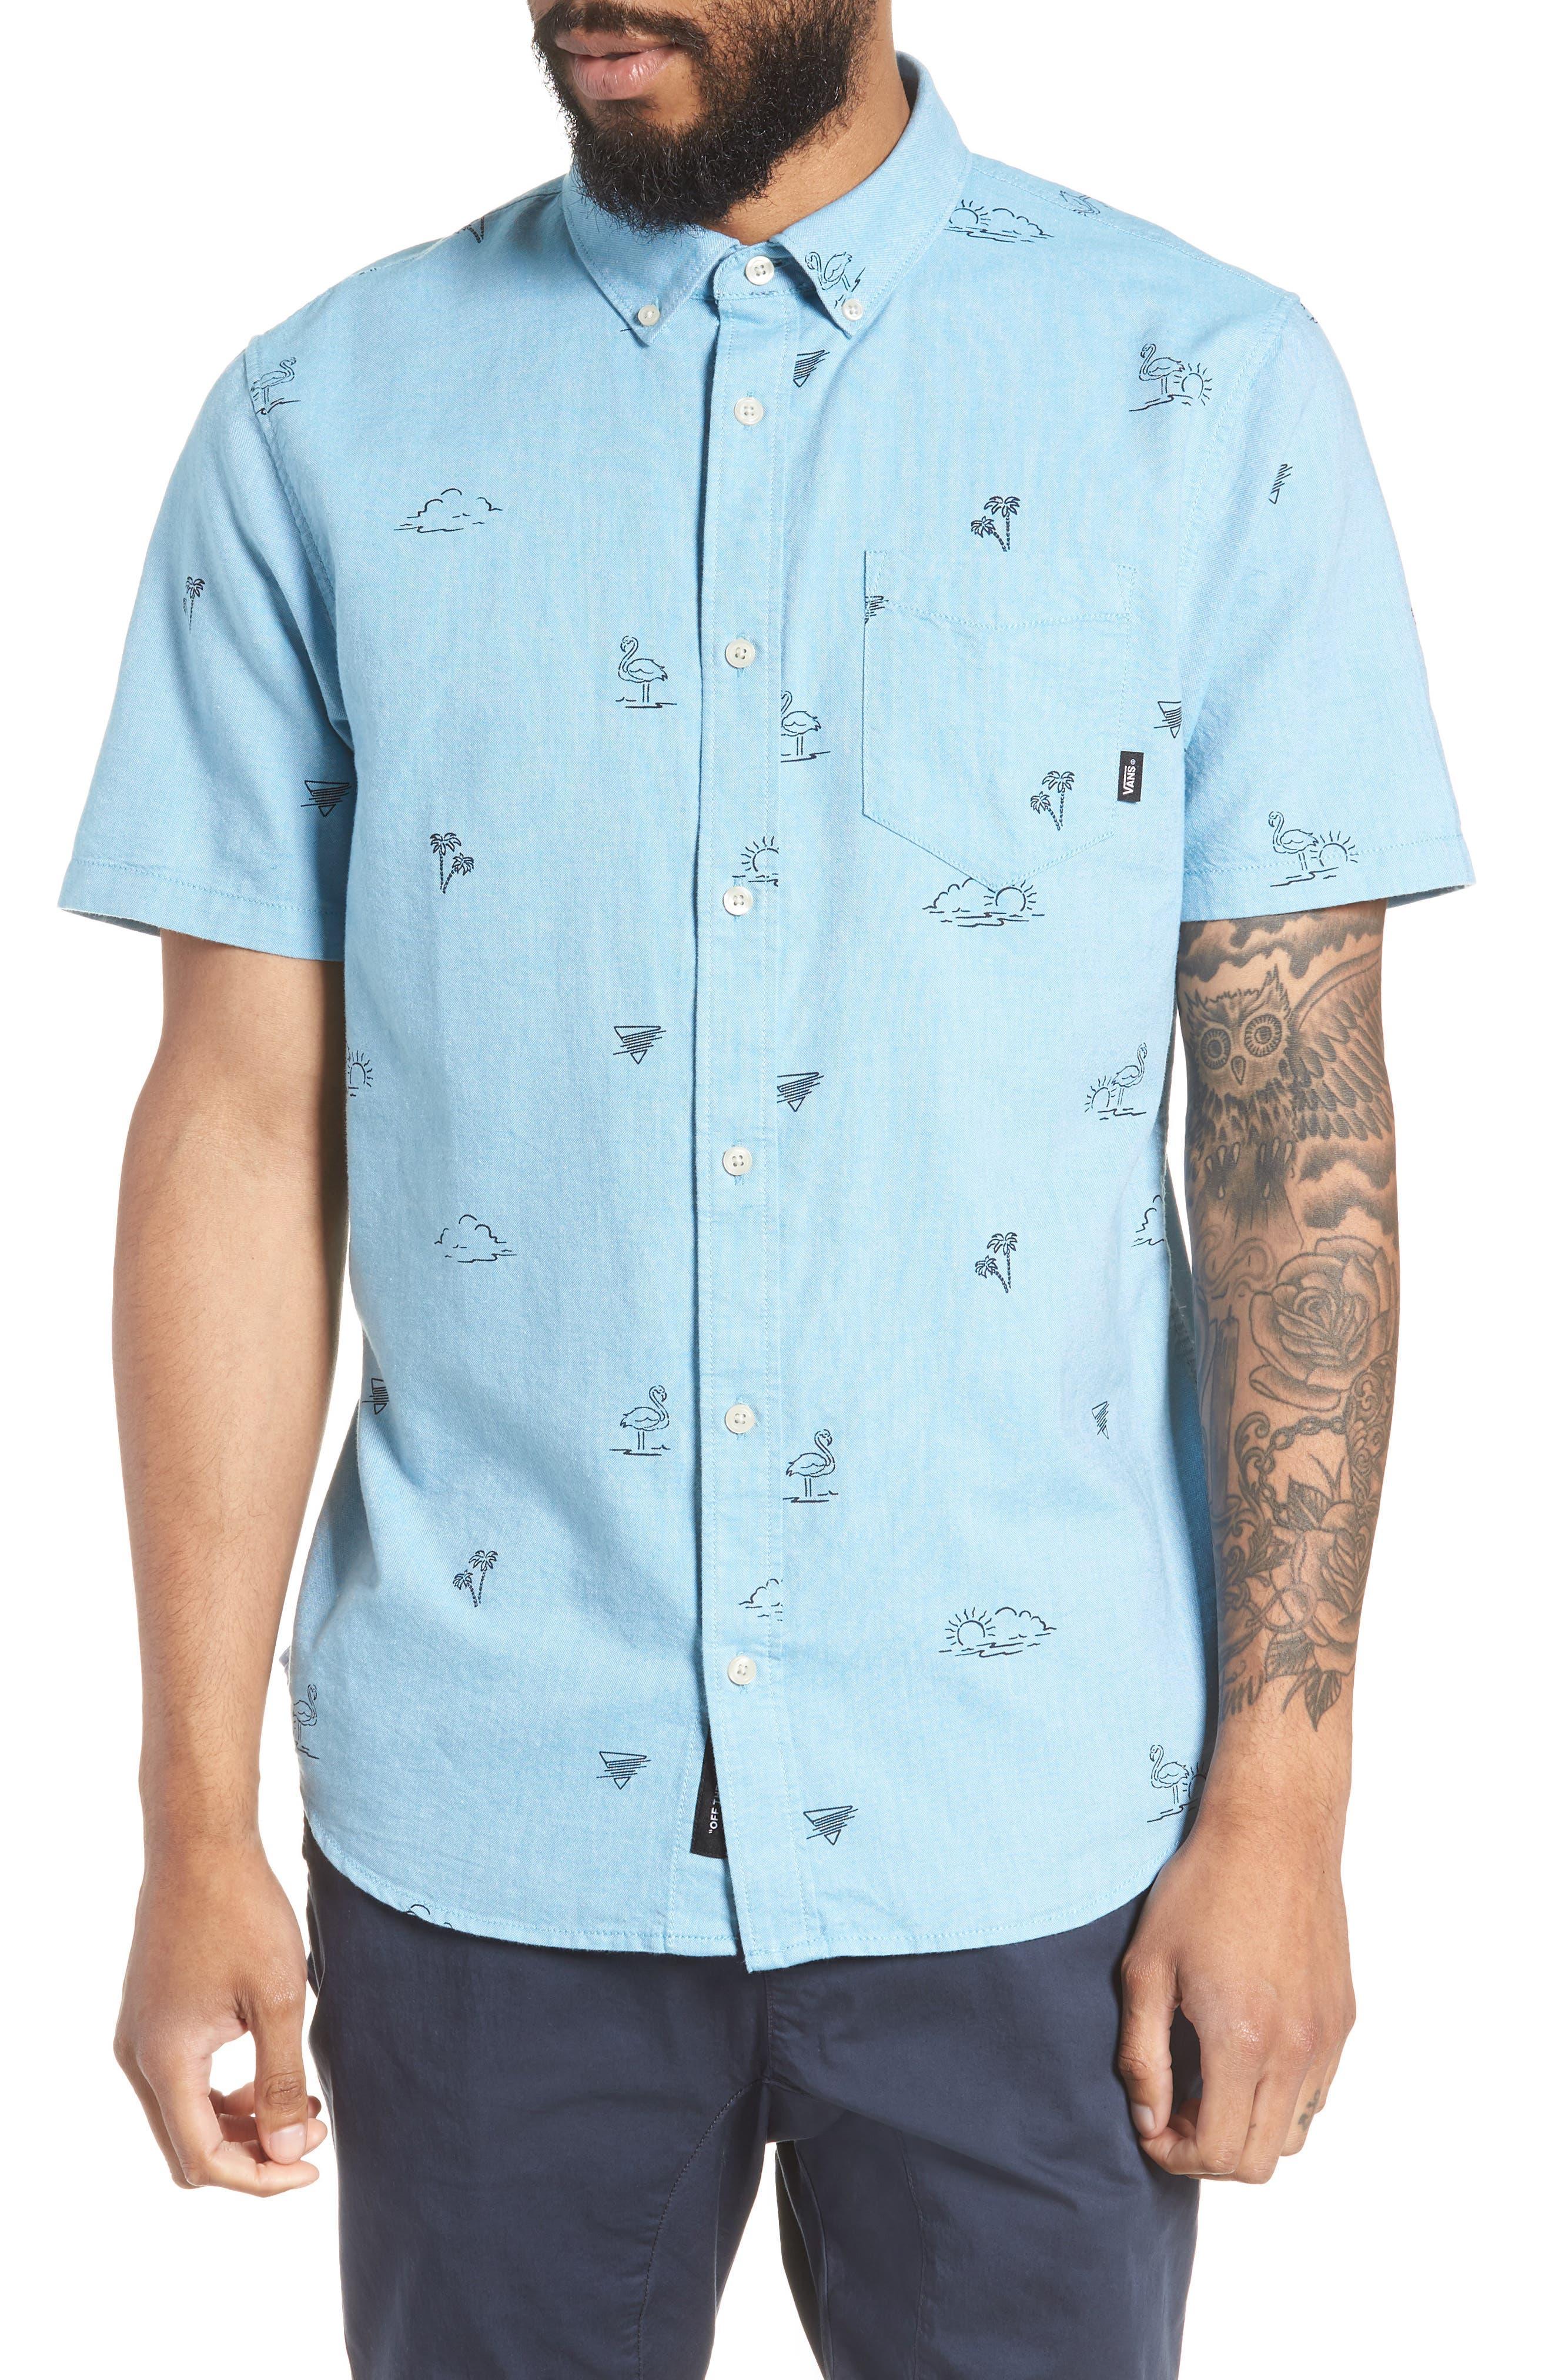 Houser Woven Shirt,                         Main,                         color, Blue Moon Road Trippin